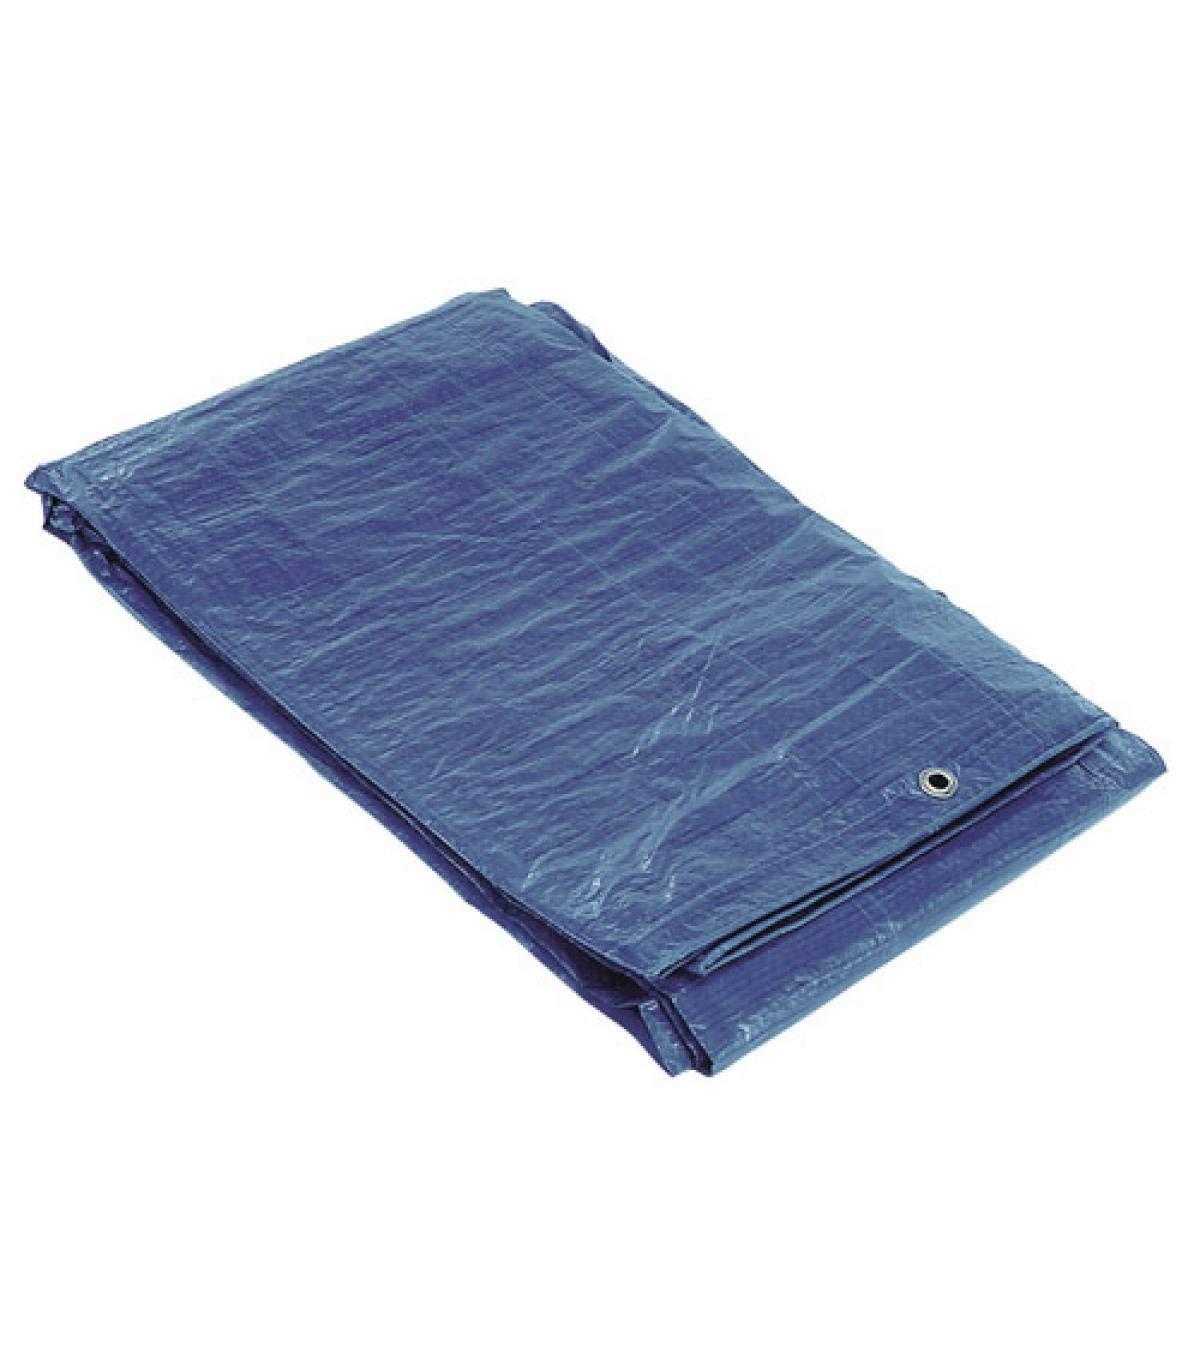 SATURNIA 15070010 Lona Impermeable Azul Con Ojetes Met/álicos 4 x 6 Metros Aproximadamente